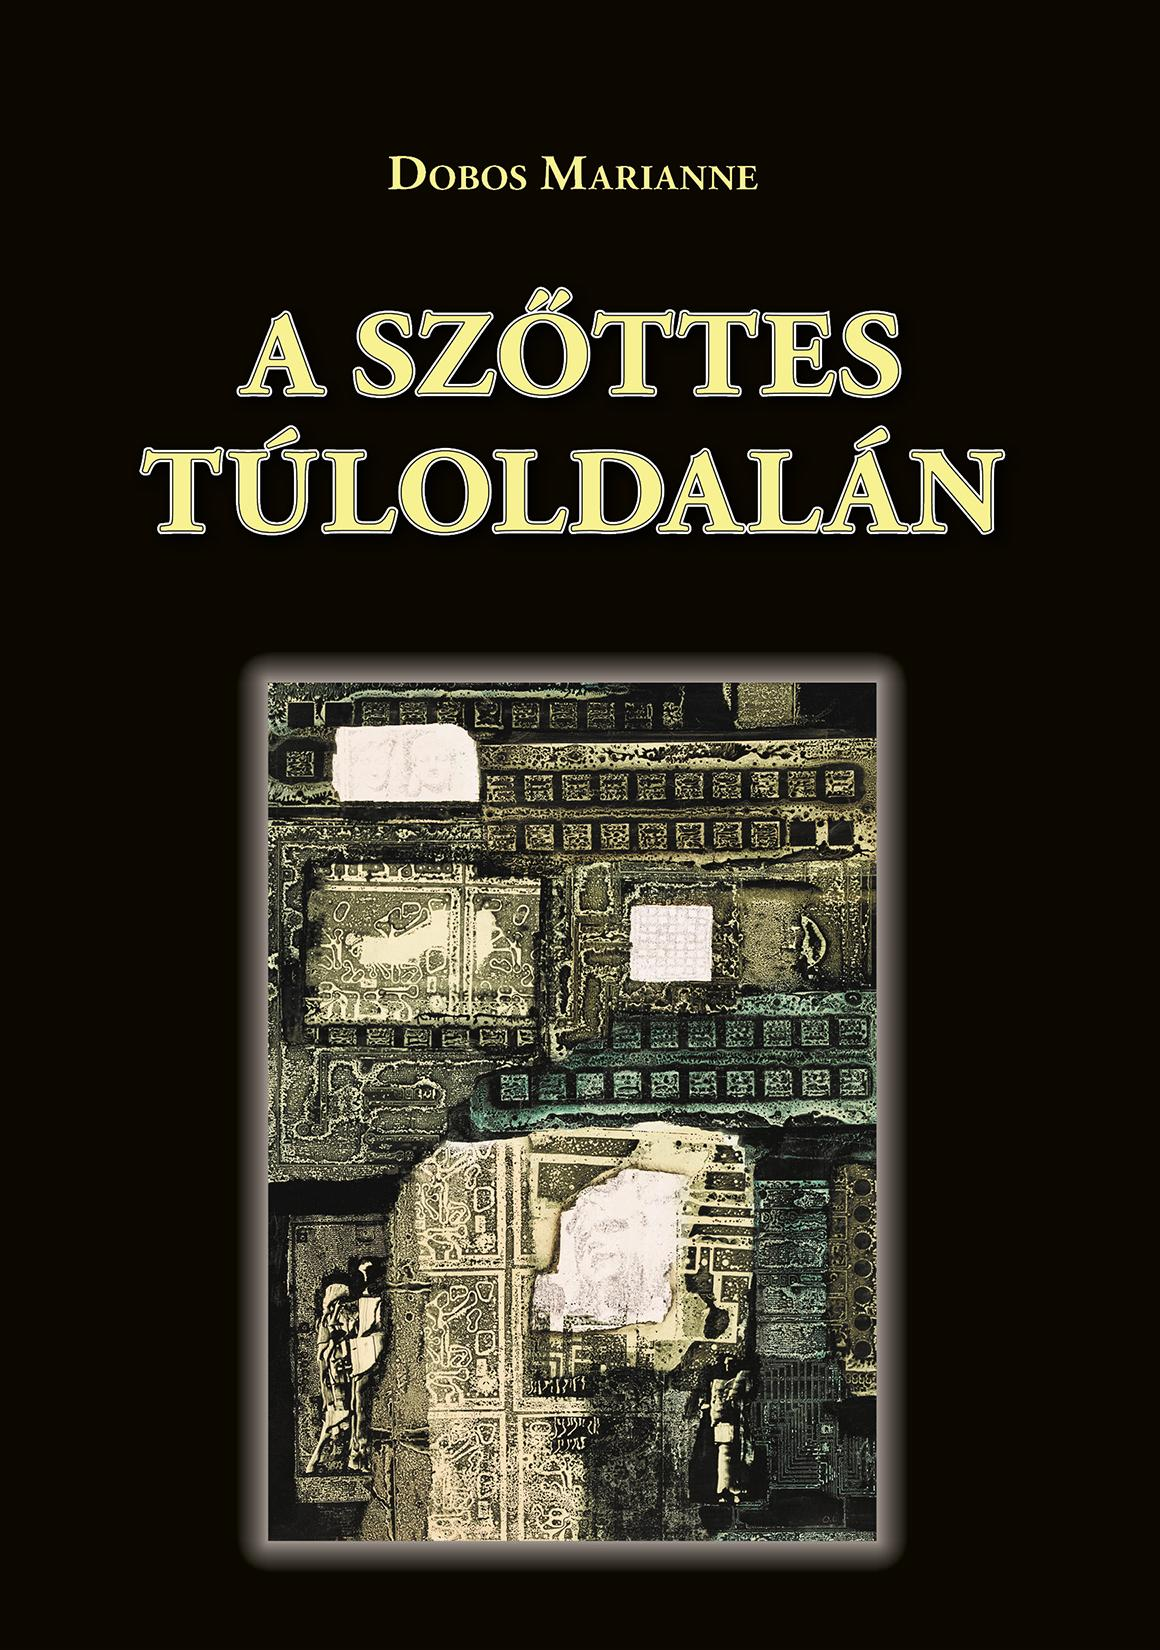 DOBOS MARIANNE - A SZŐTTES TÚLOLDALÁN